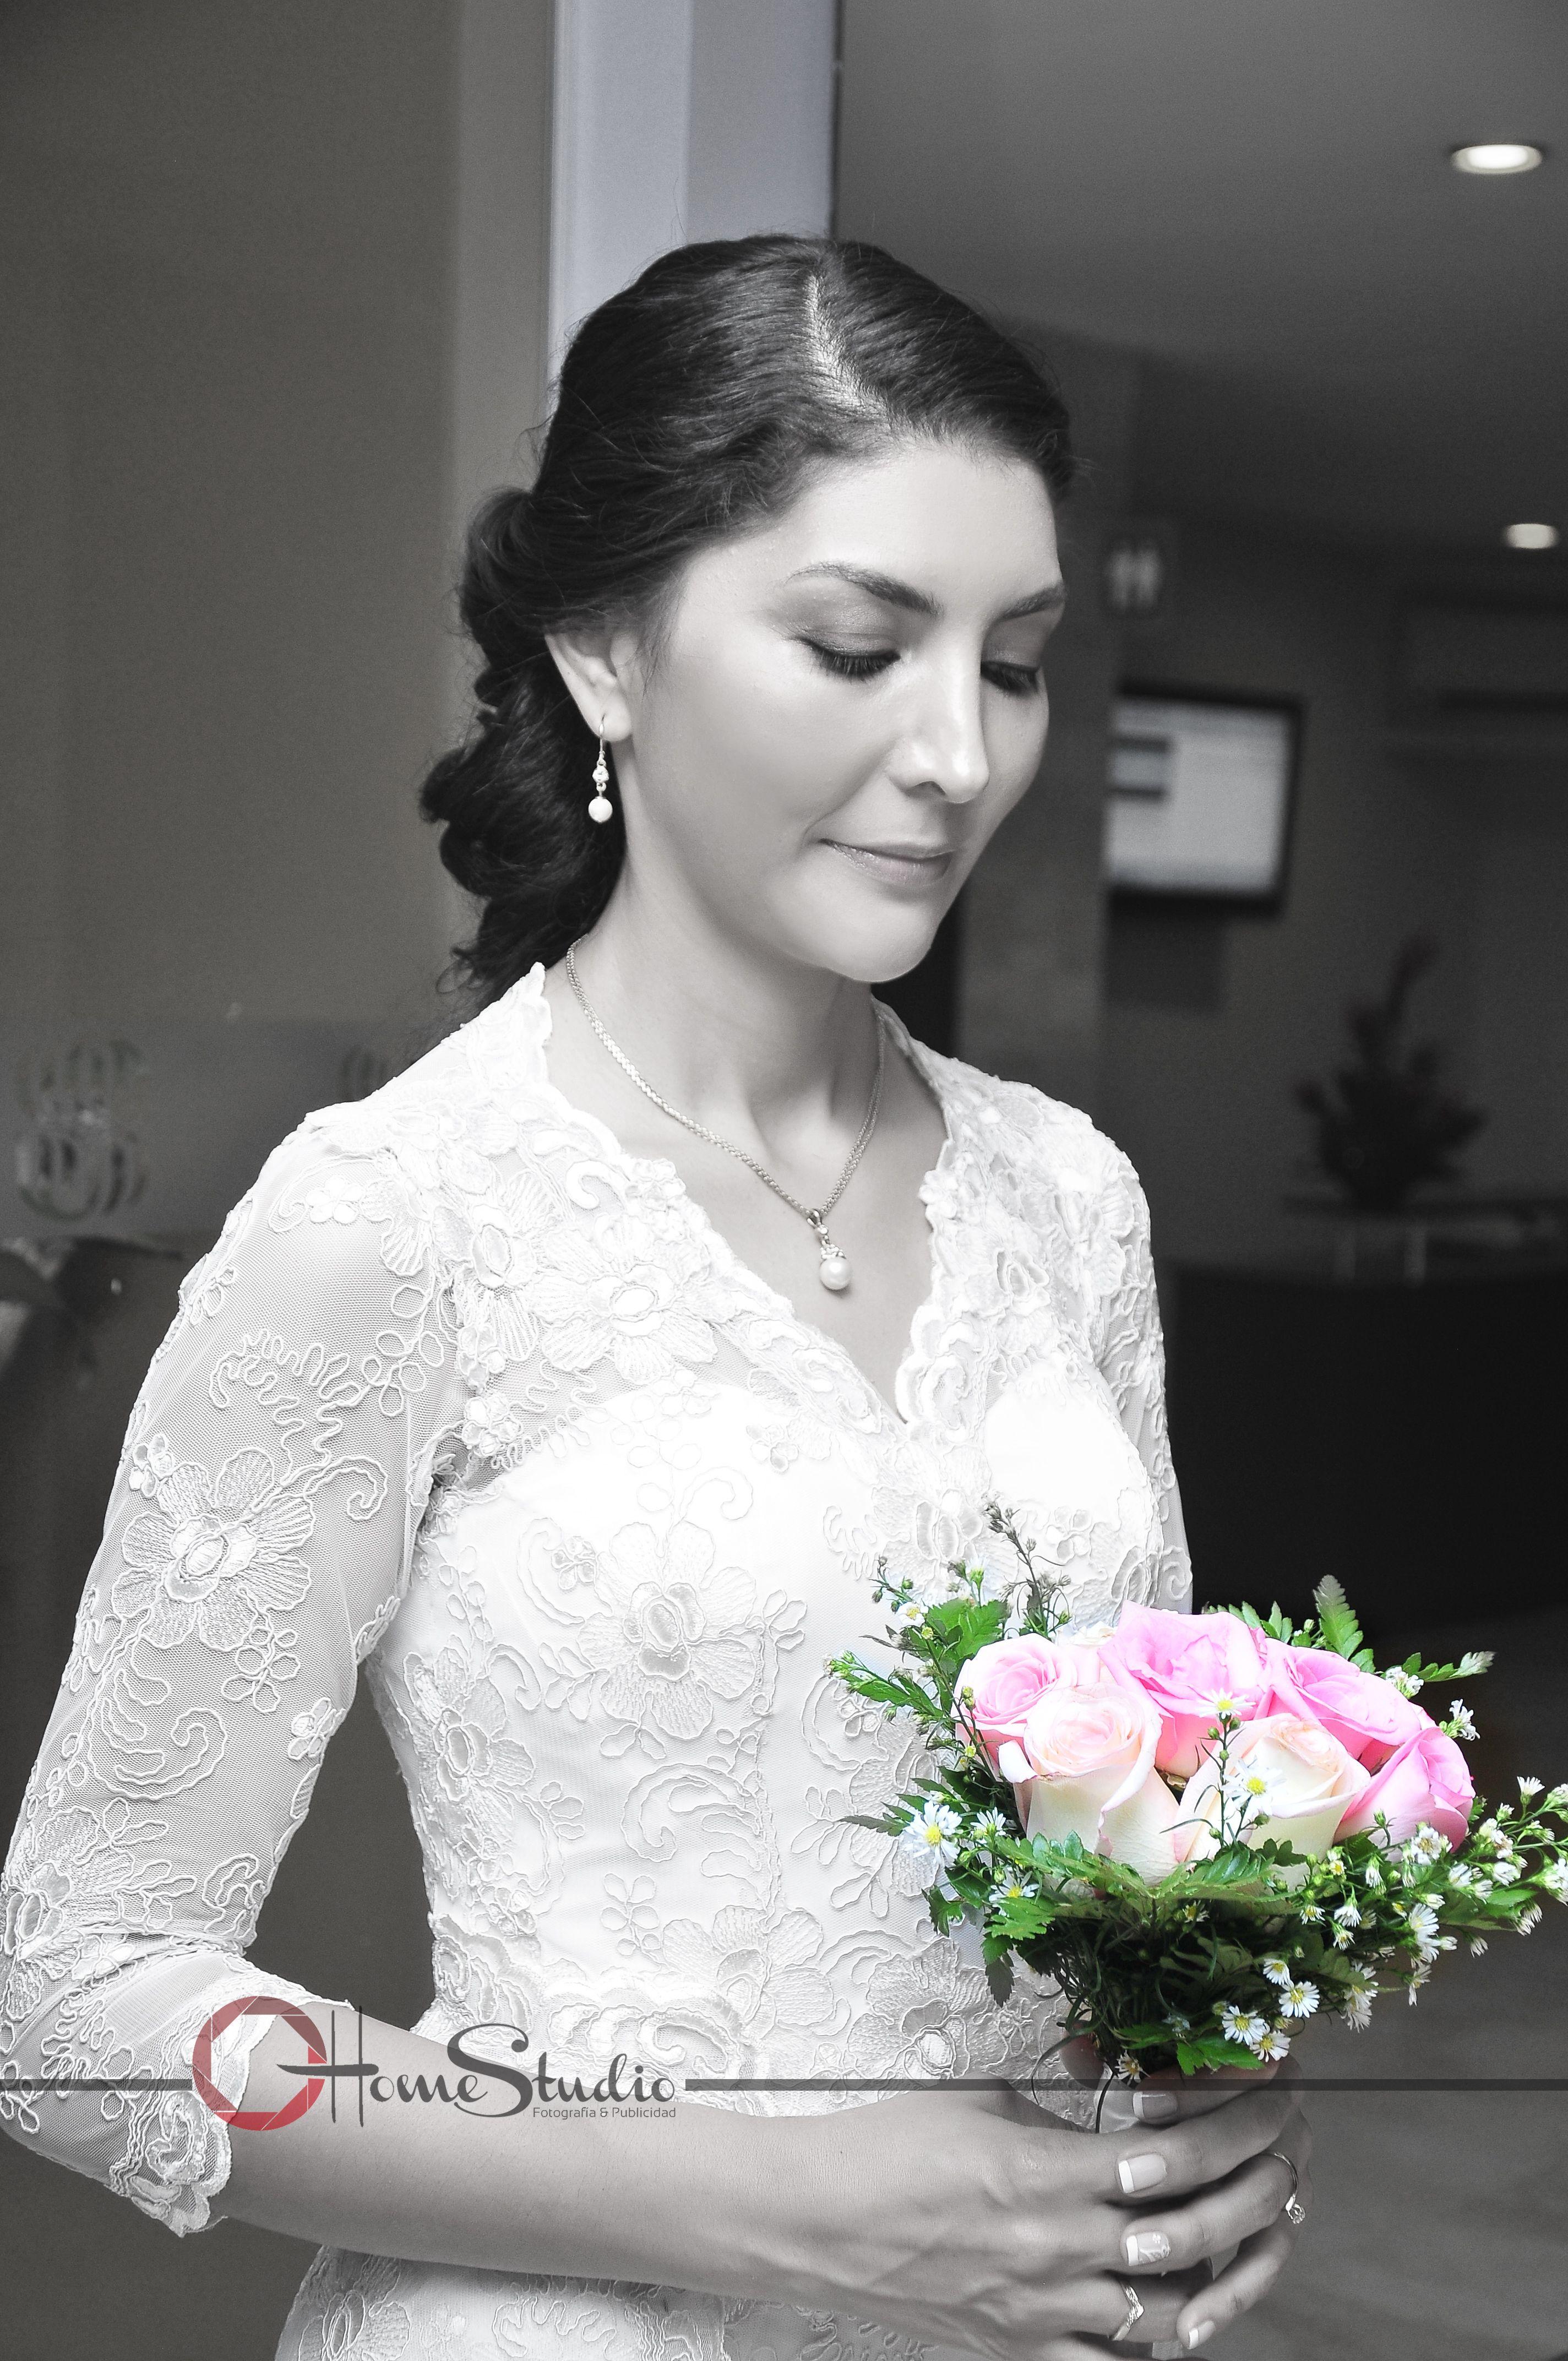 FOTO ESTUDIO  DE NOVIA.  #cabello# #peinado# #novia# #vestido# #detalles# #bodas# #fotografía# #ramo#